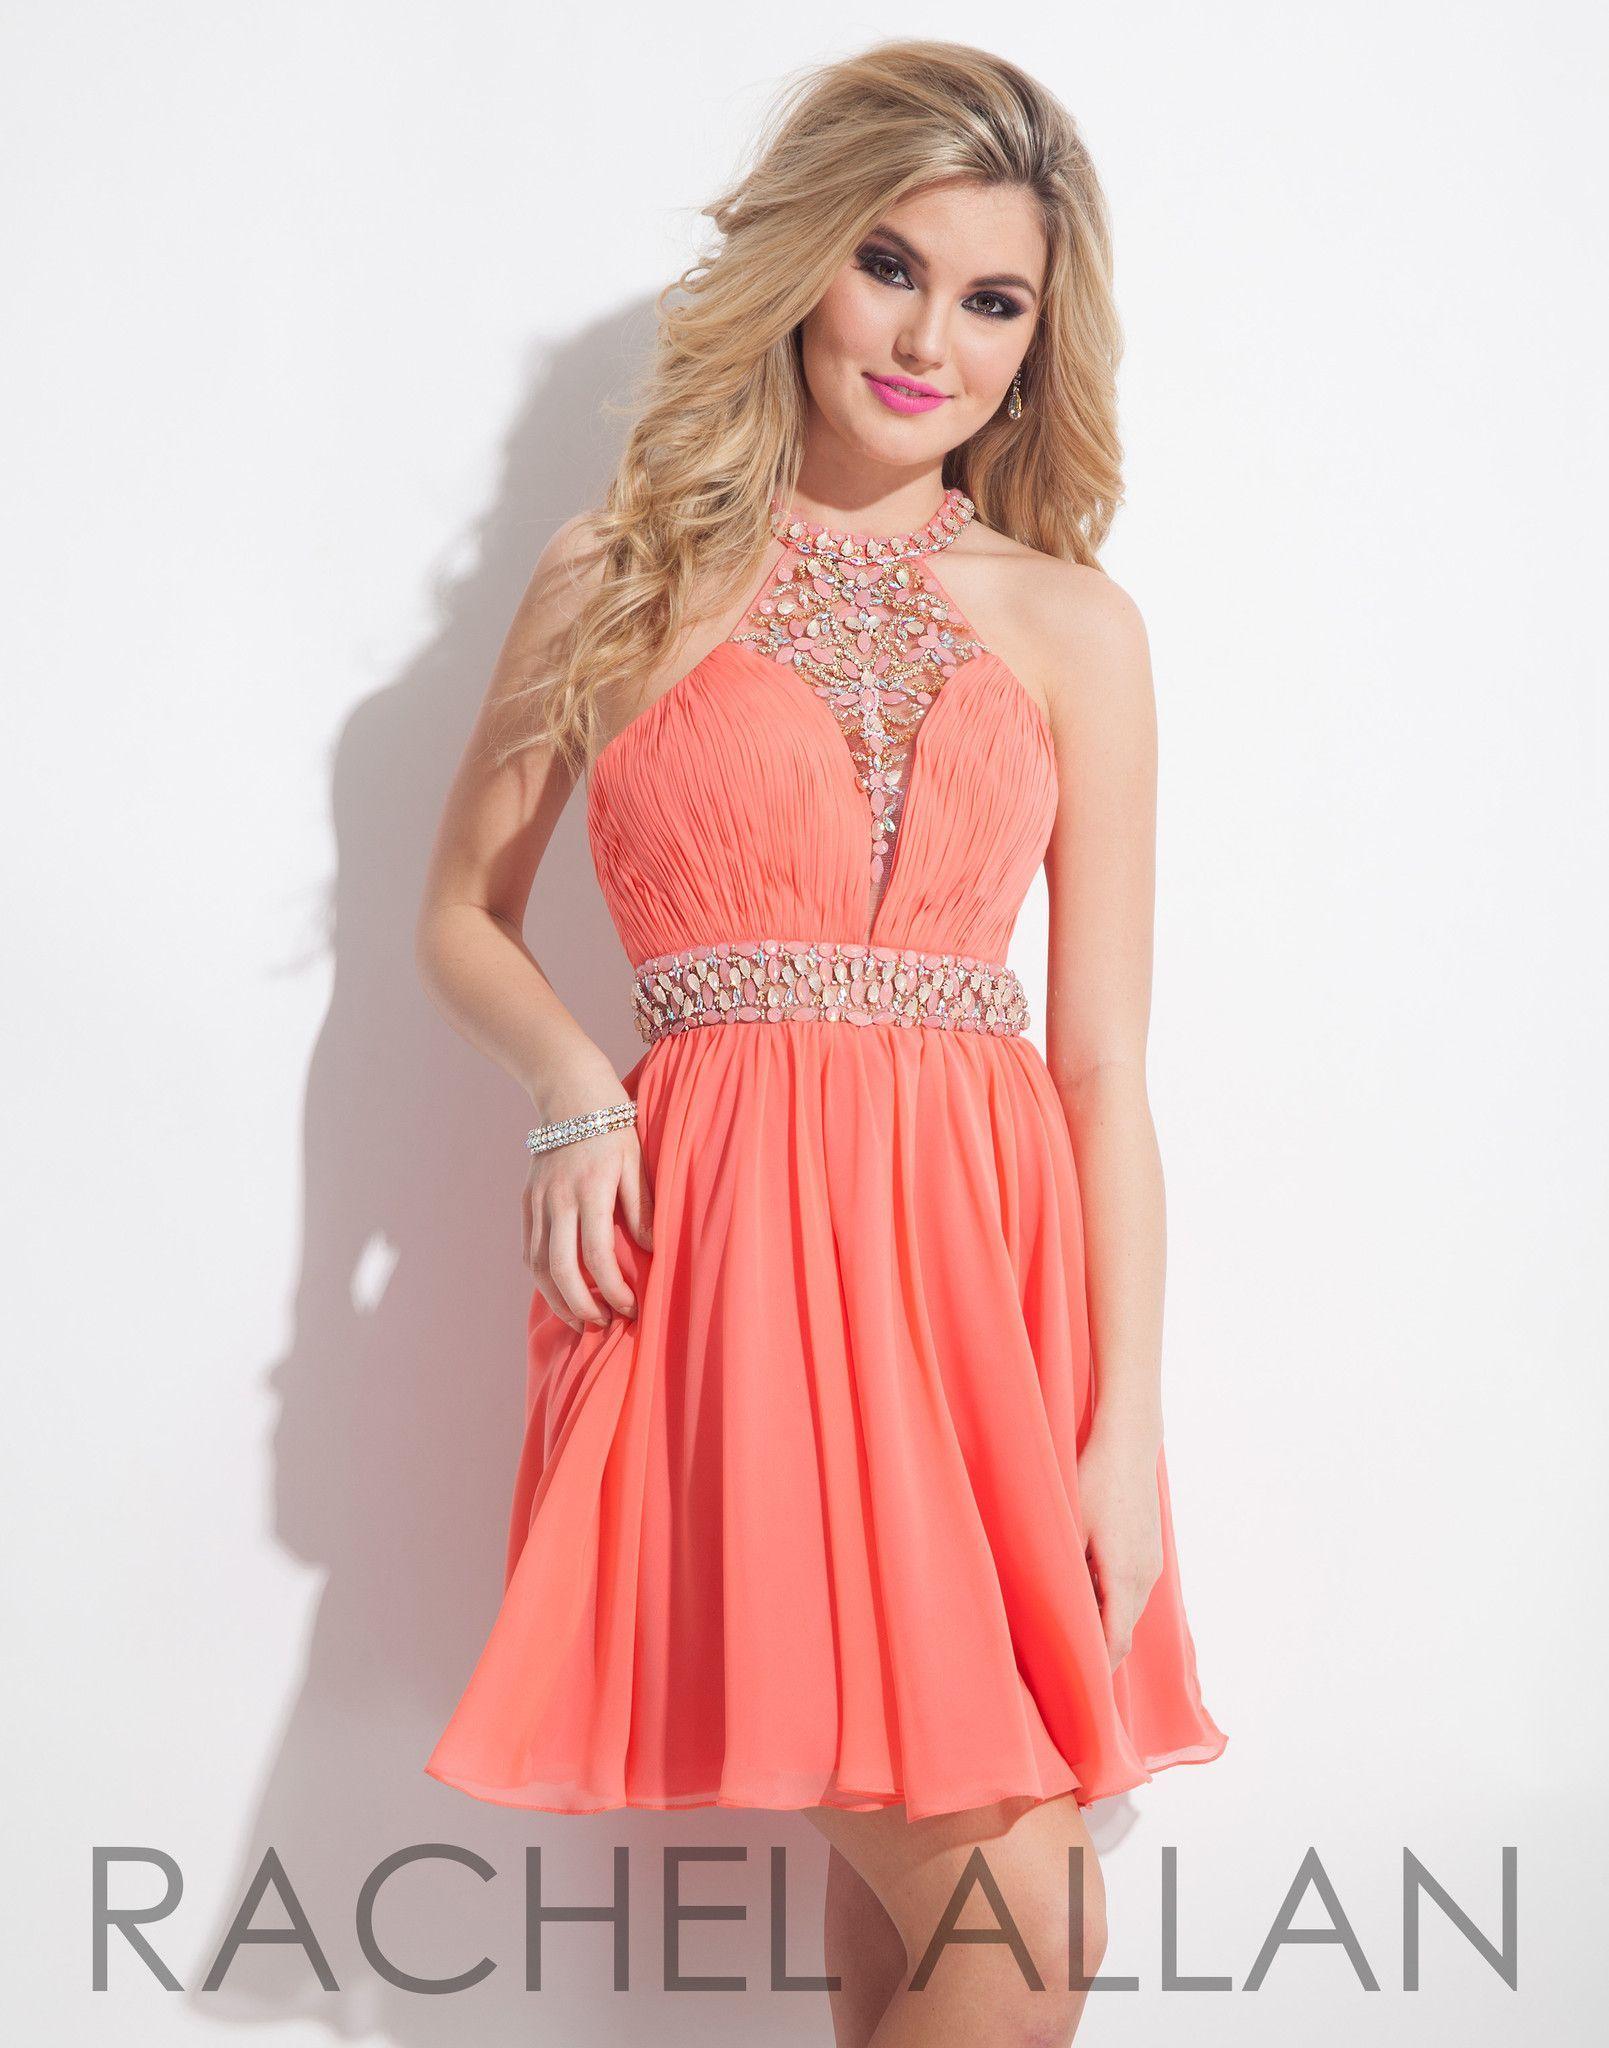 Rachel allan coral homecoming dress dresses pinterest